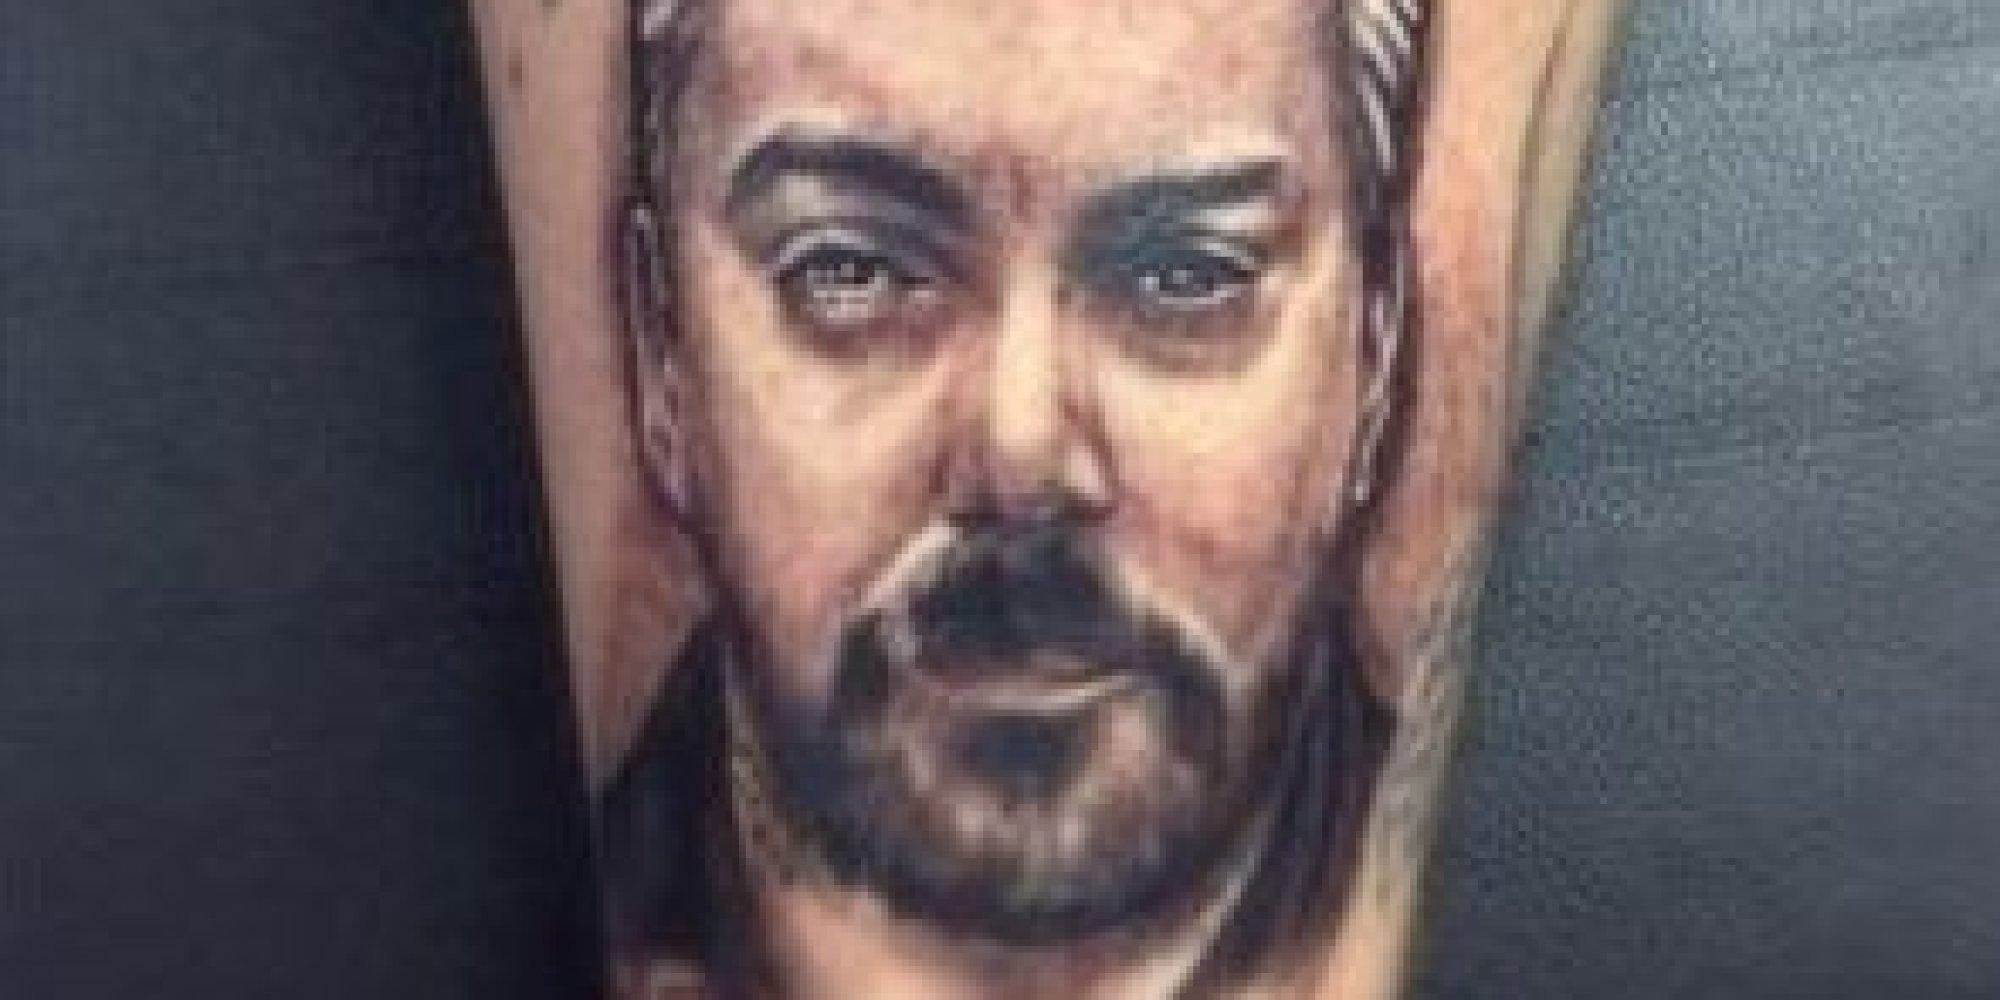 ian watkins mugshot  u0026 39 tattoo u0026 39  picture posted online  picture